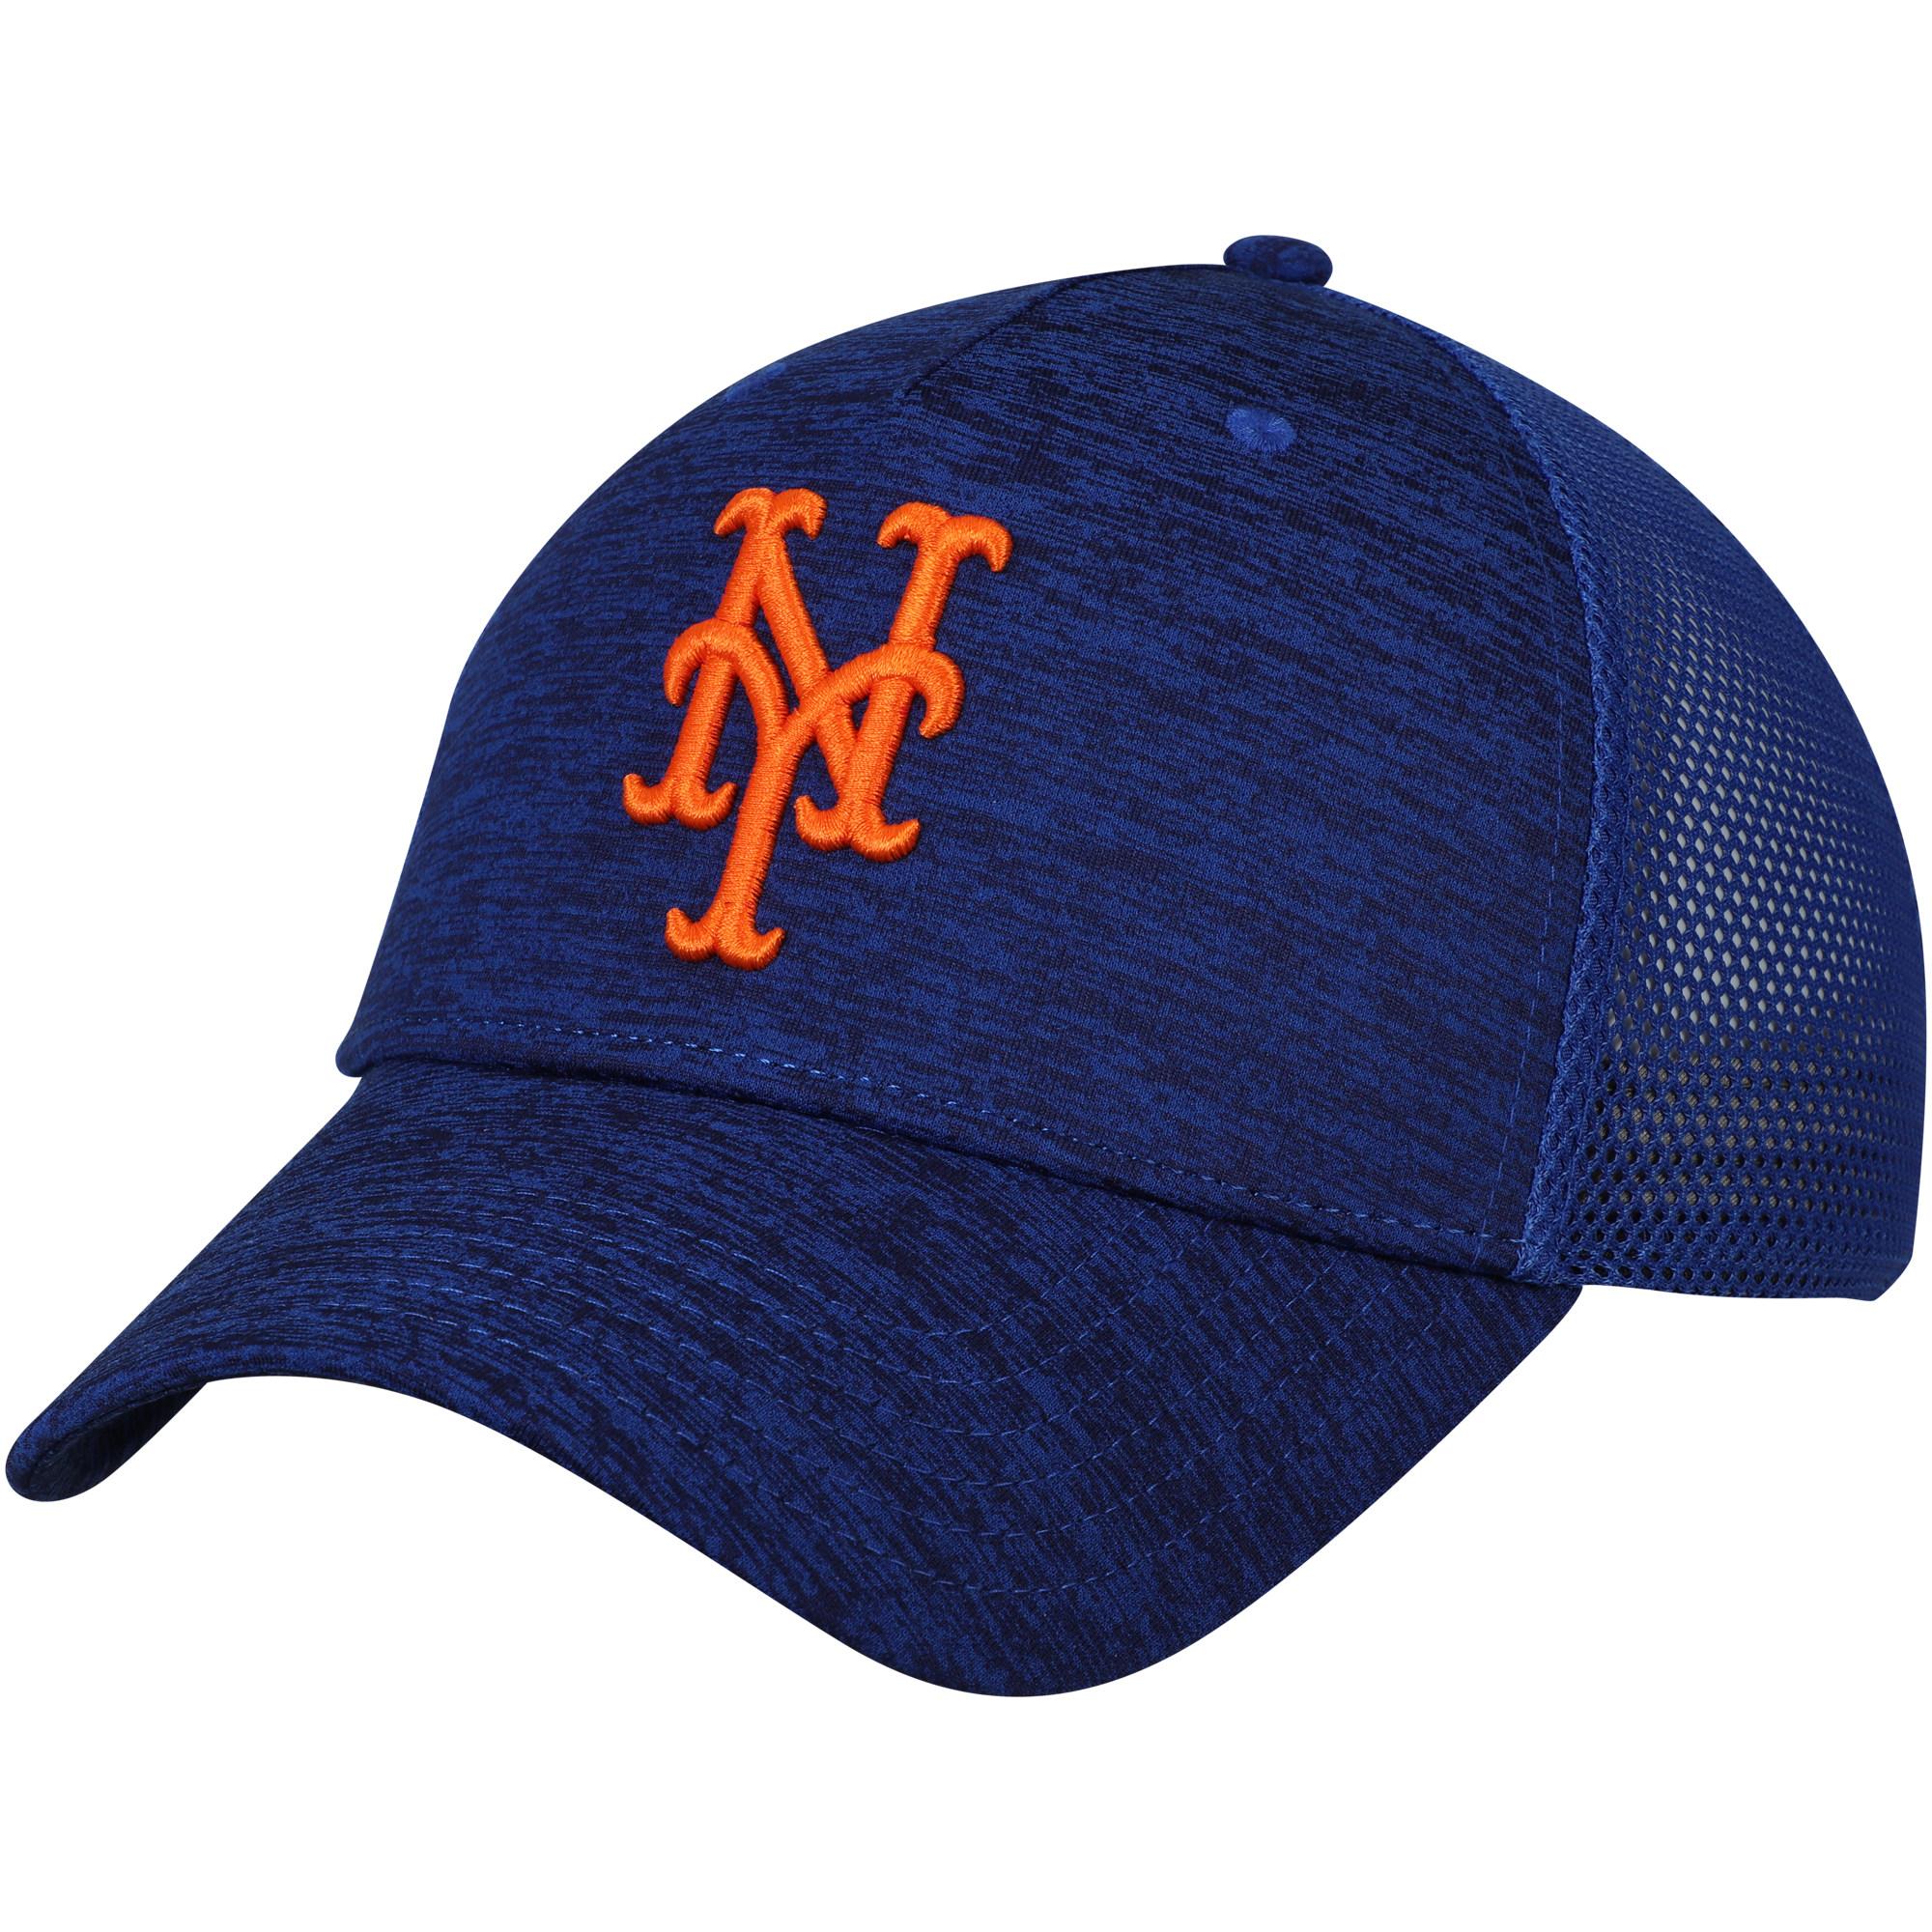 New York Mets Under Armour Twist Closer Trucker Performance Adjustable Hat - Royal - OSFA